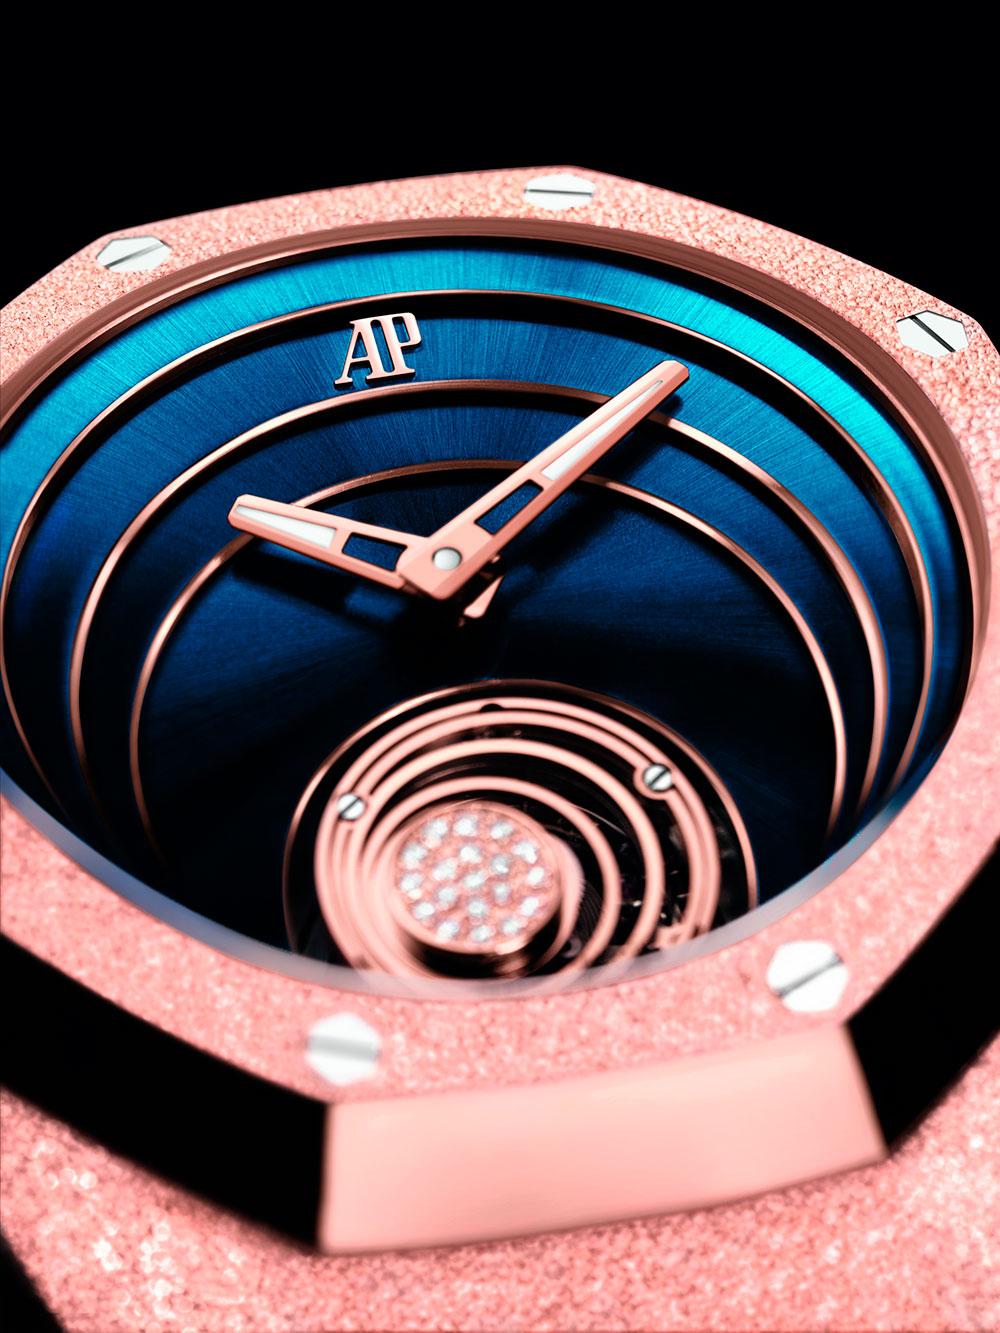 Esfera del Audemars Piguet Royal Oak Concept Flying Tourbillon oro rosa